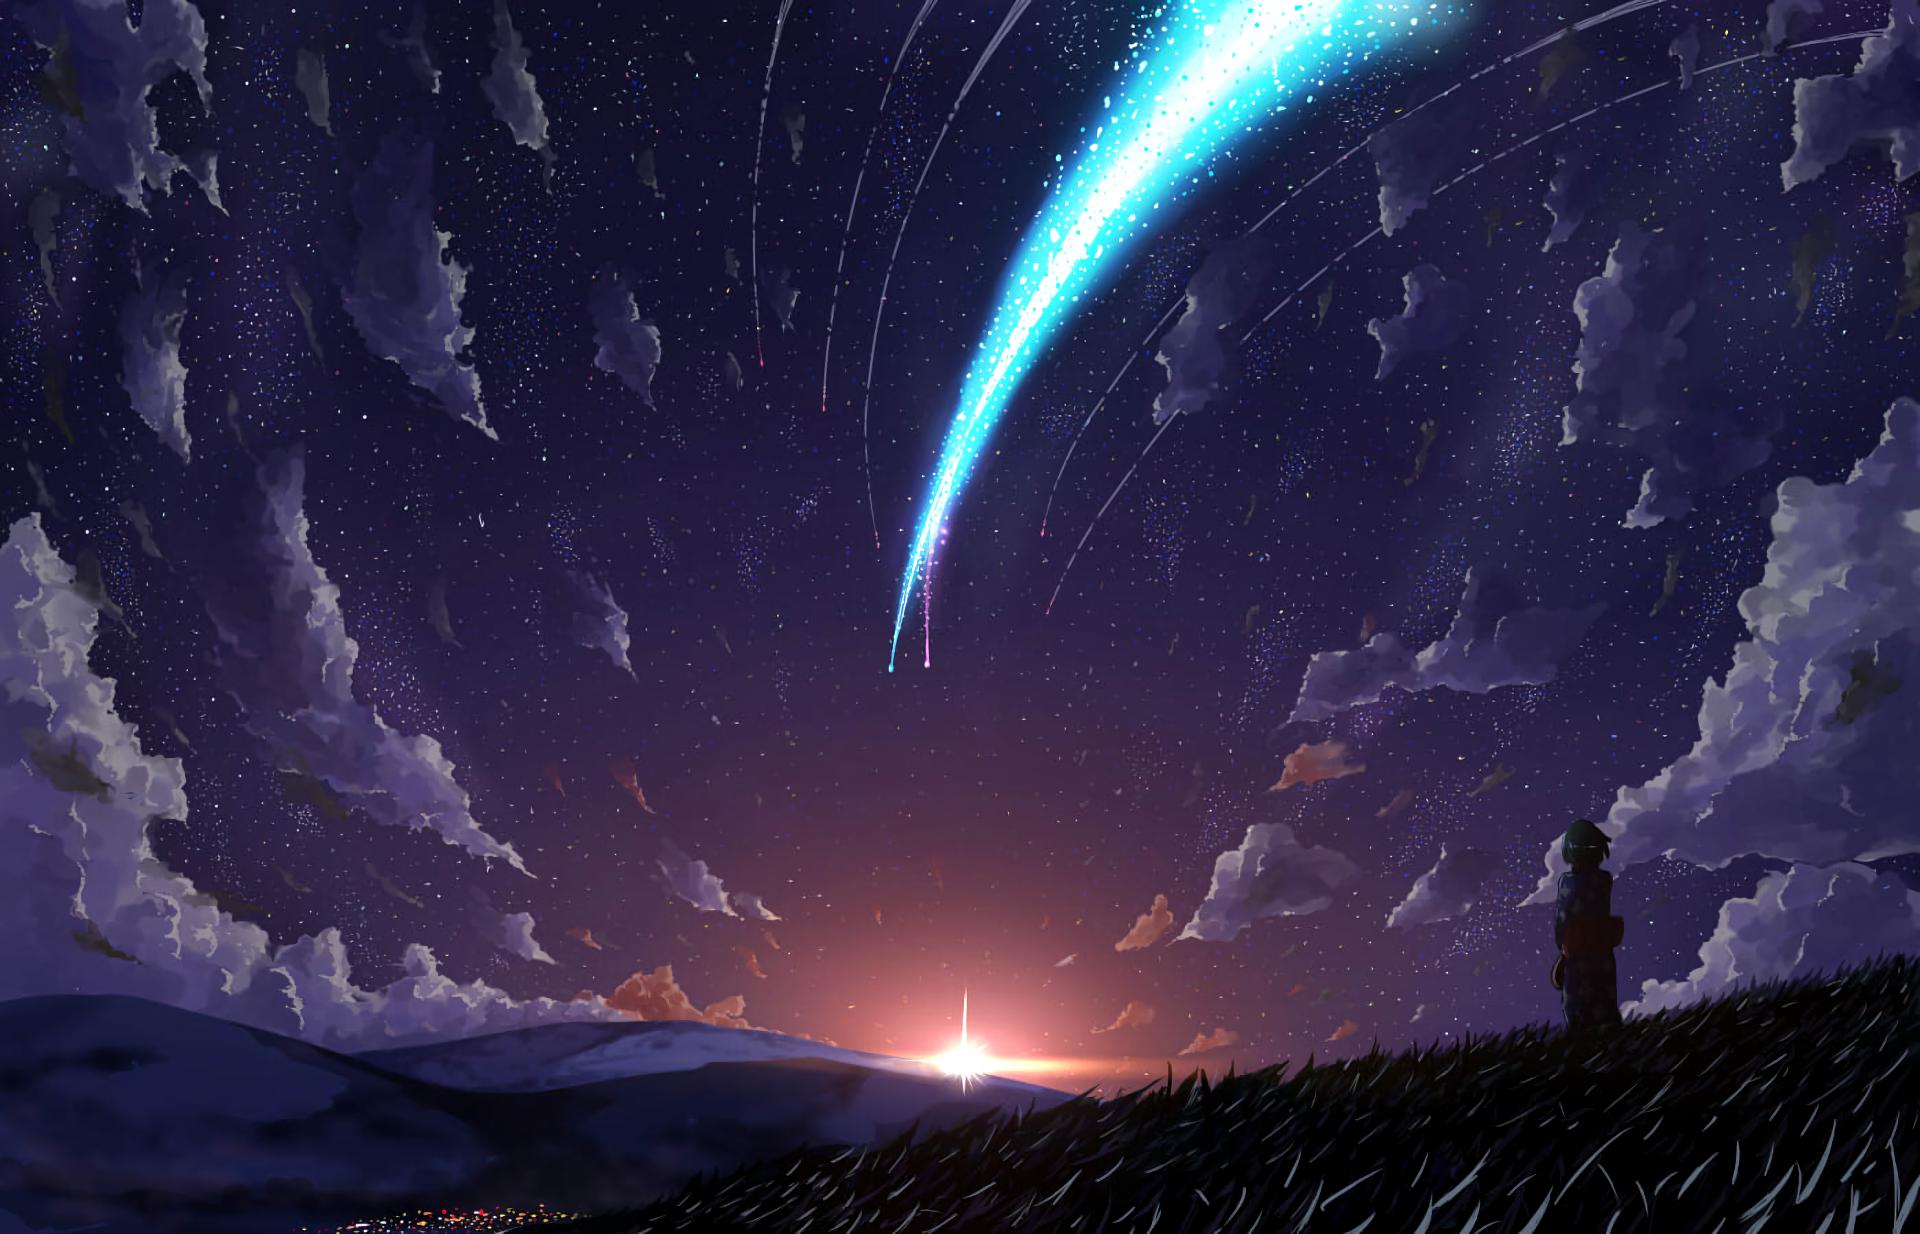 4k Kimi No Na Wa Wallpaper Kimi No Na Wa Wallpaper Anime Scenery Hd Anime Wallpapers